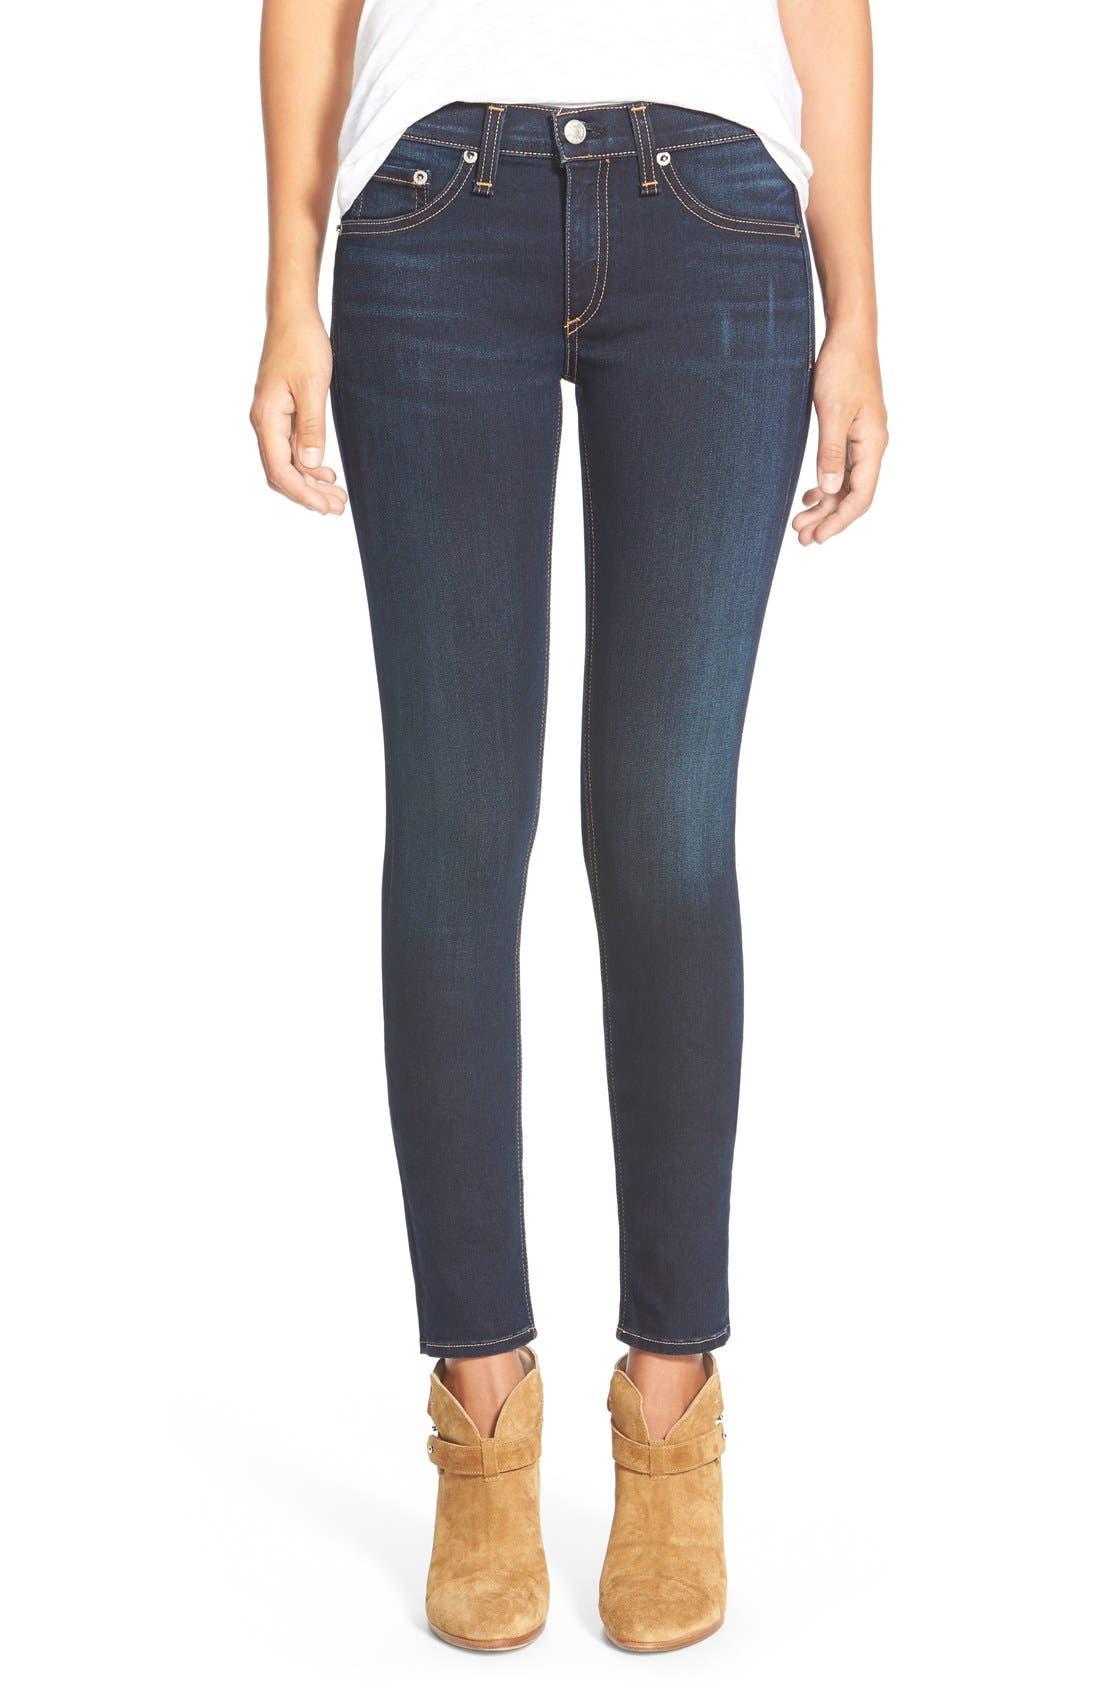 Alternate Image 1 Selected - rag & bone/JEAN Skinny Stretch Jeans (Bedford)